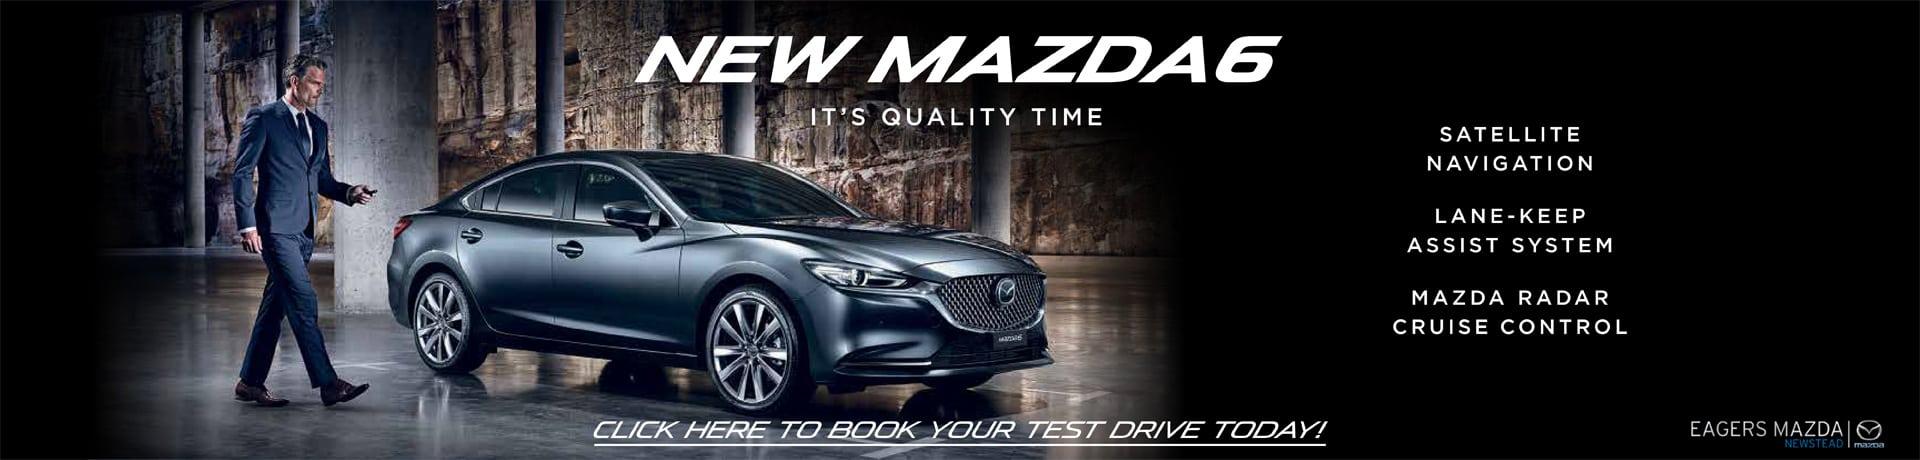 Eagers Mazda | Mazda Dealer Newstead